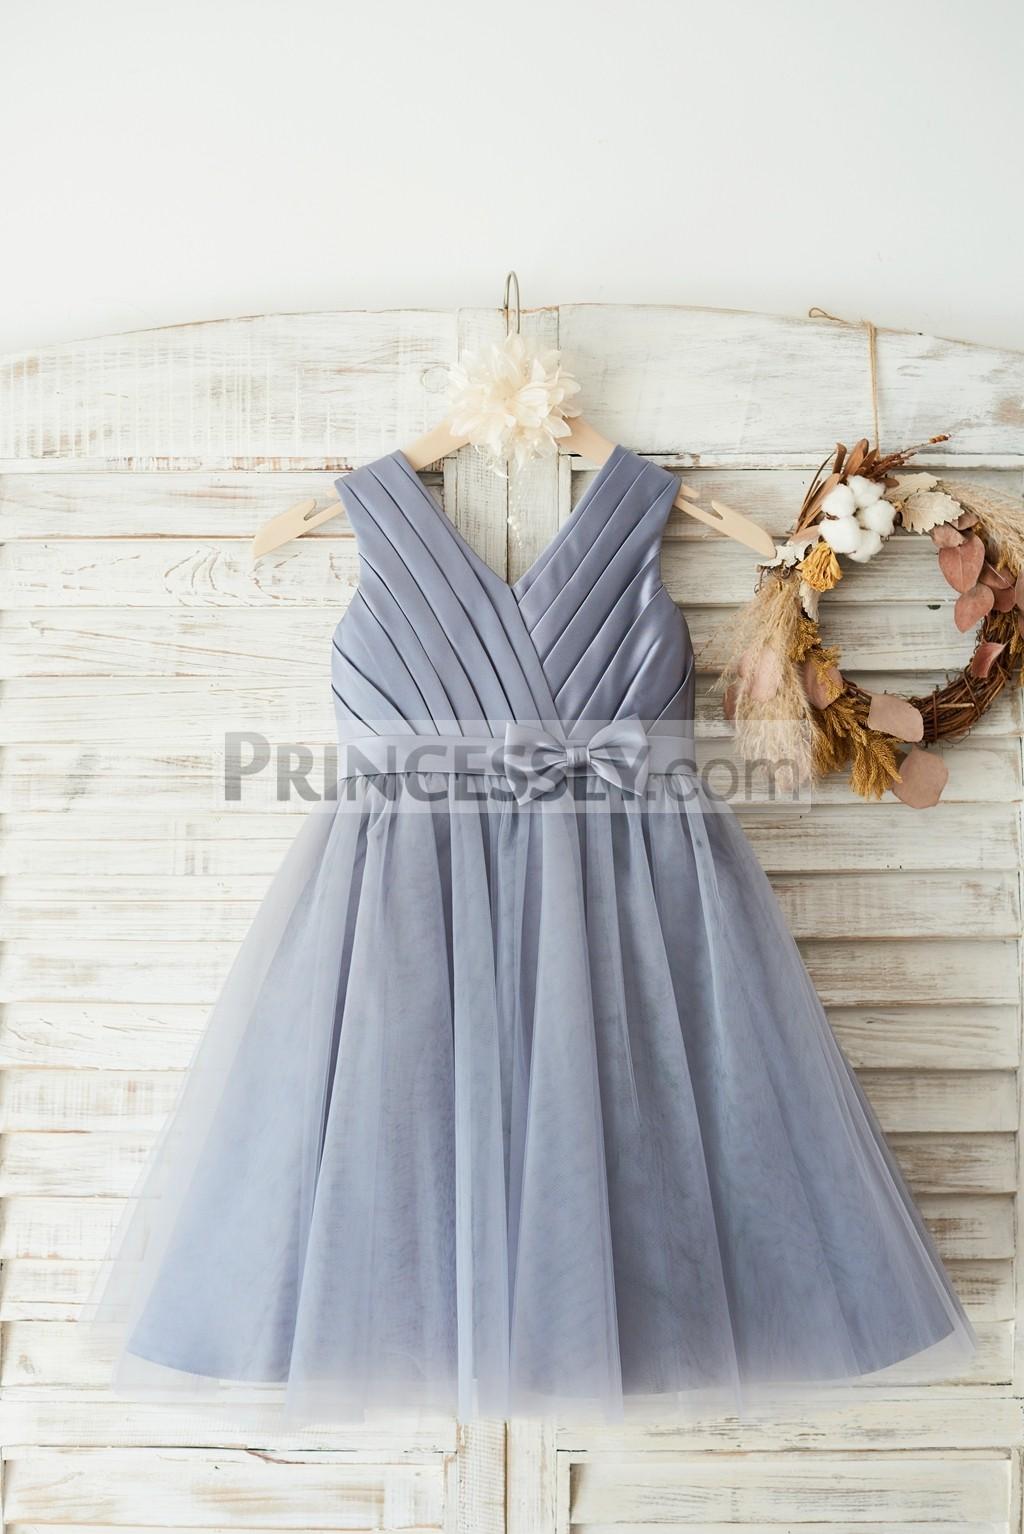 Pleated satin tulle wedding flower girl dress